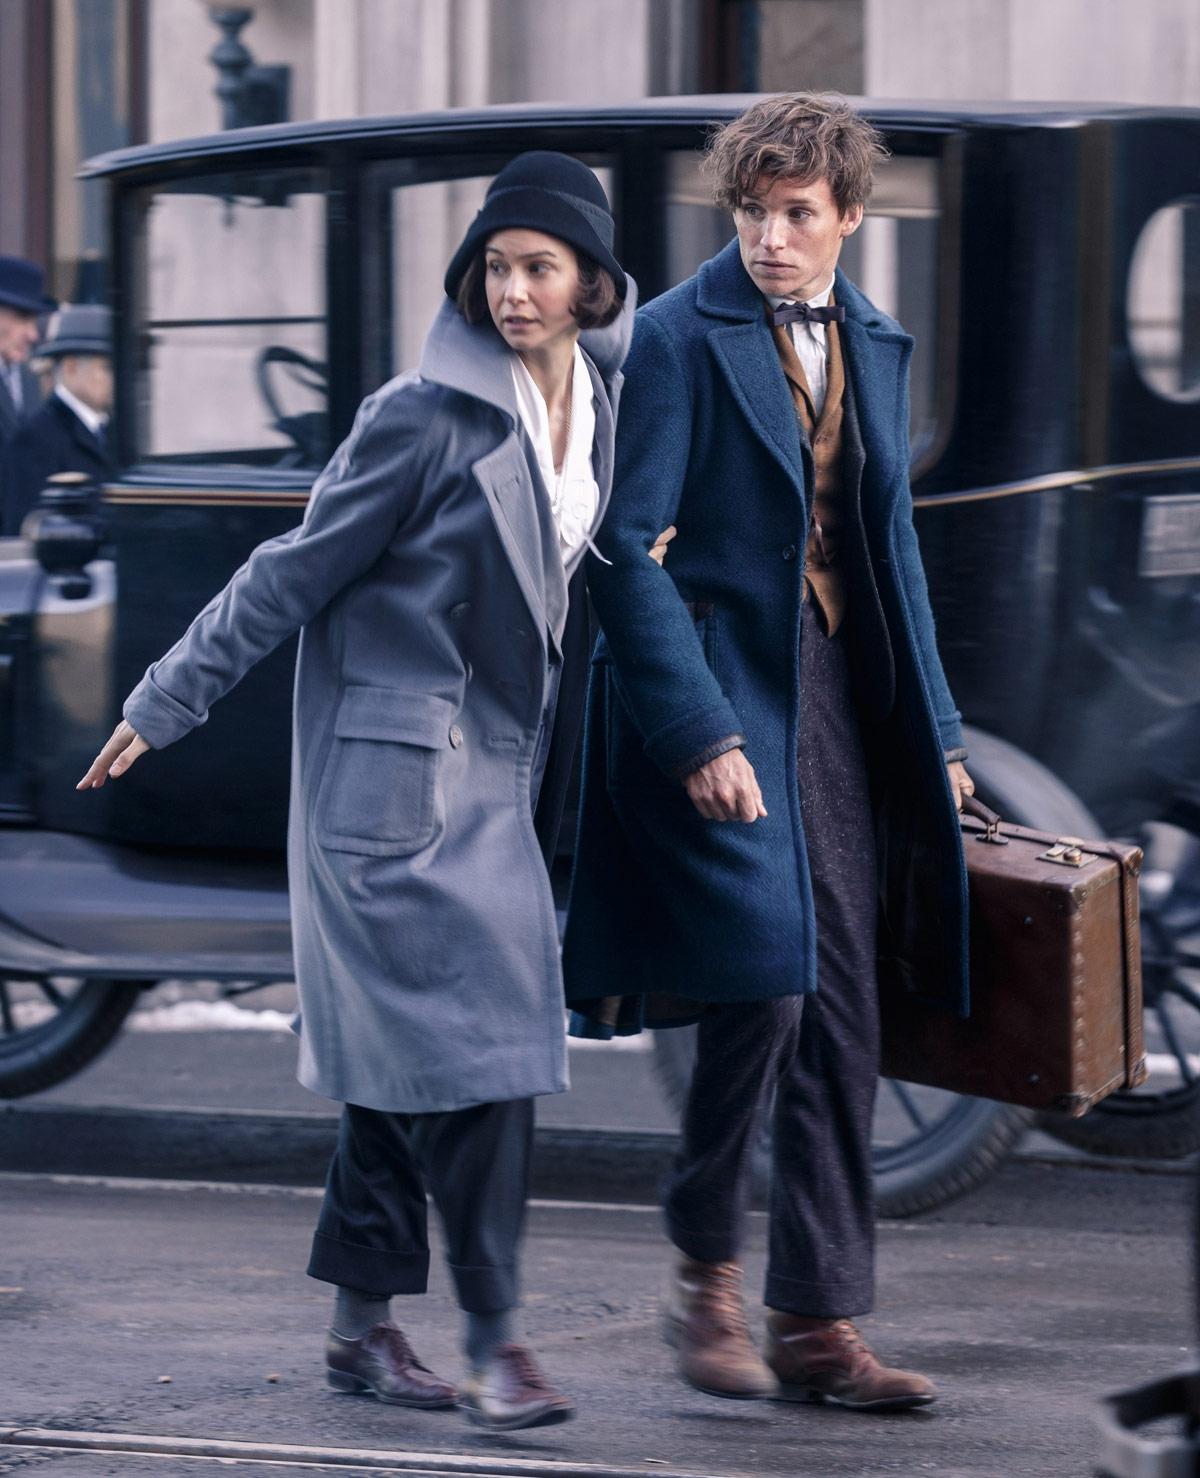 Harry Potter prequel 'Fantastic Beasts and Where to Find Them' krijgt twee vervolgfilms